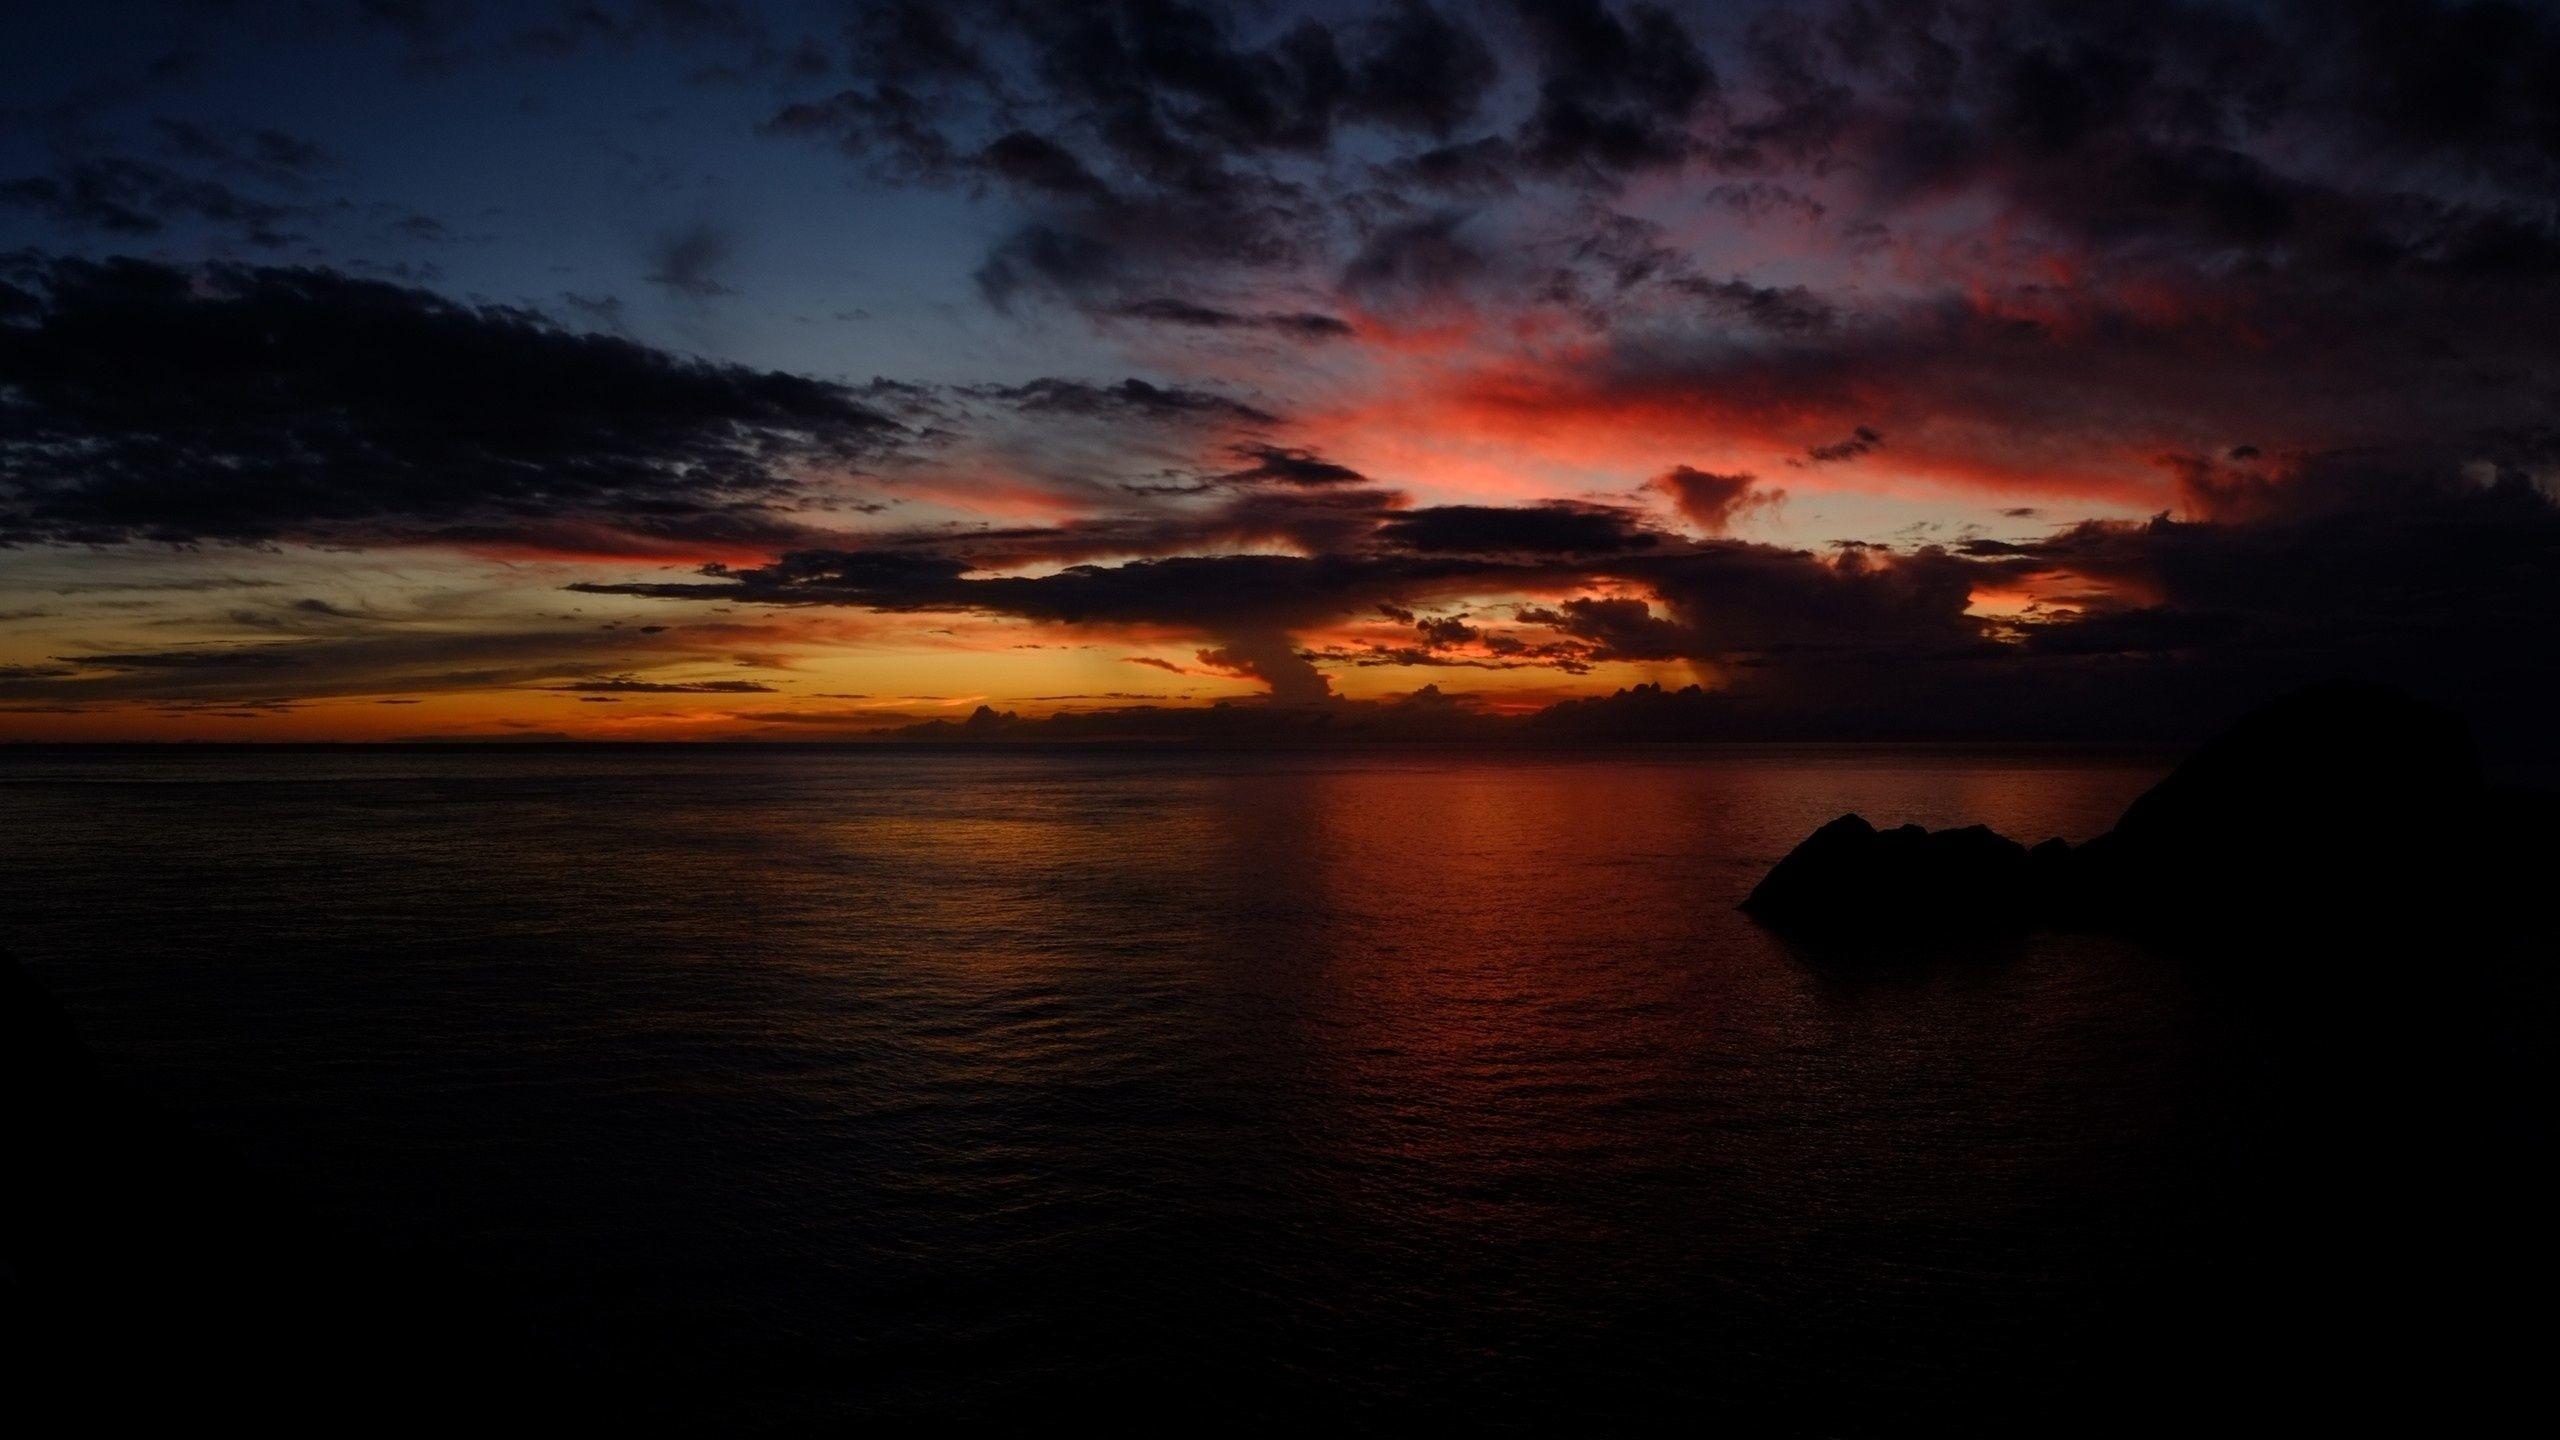 Res: 2560x1440, dark sunset hd |  Sunset Clouds & Dark Ocean desktop PC and Mac  wallpaper